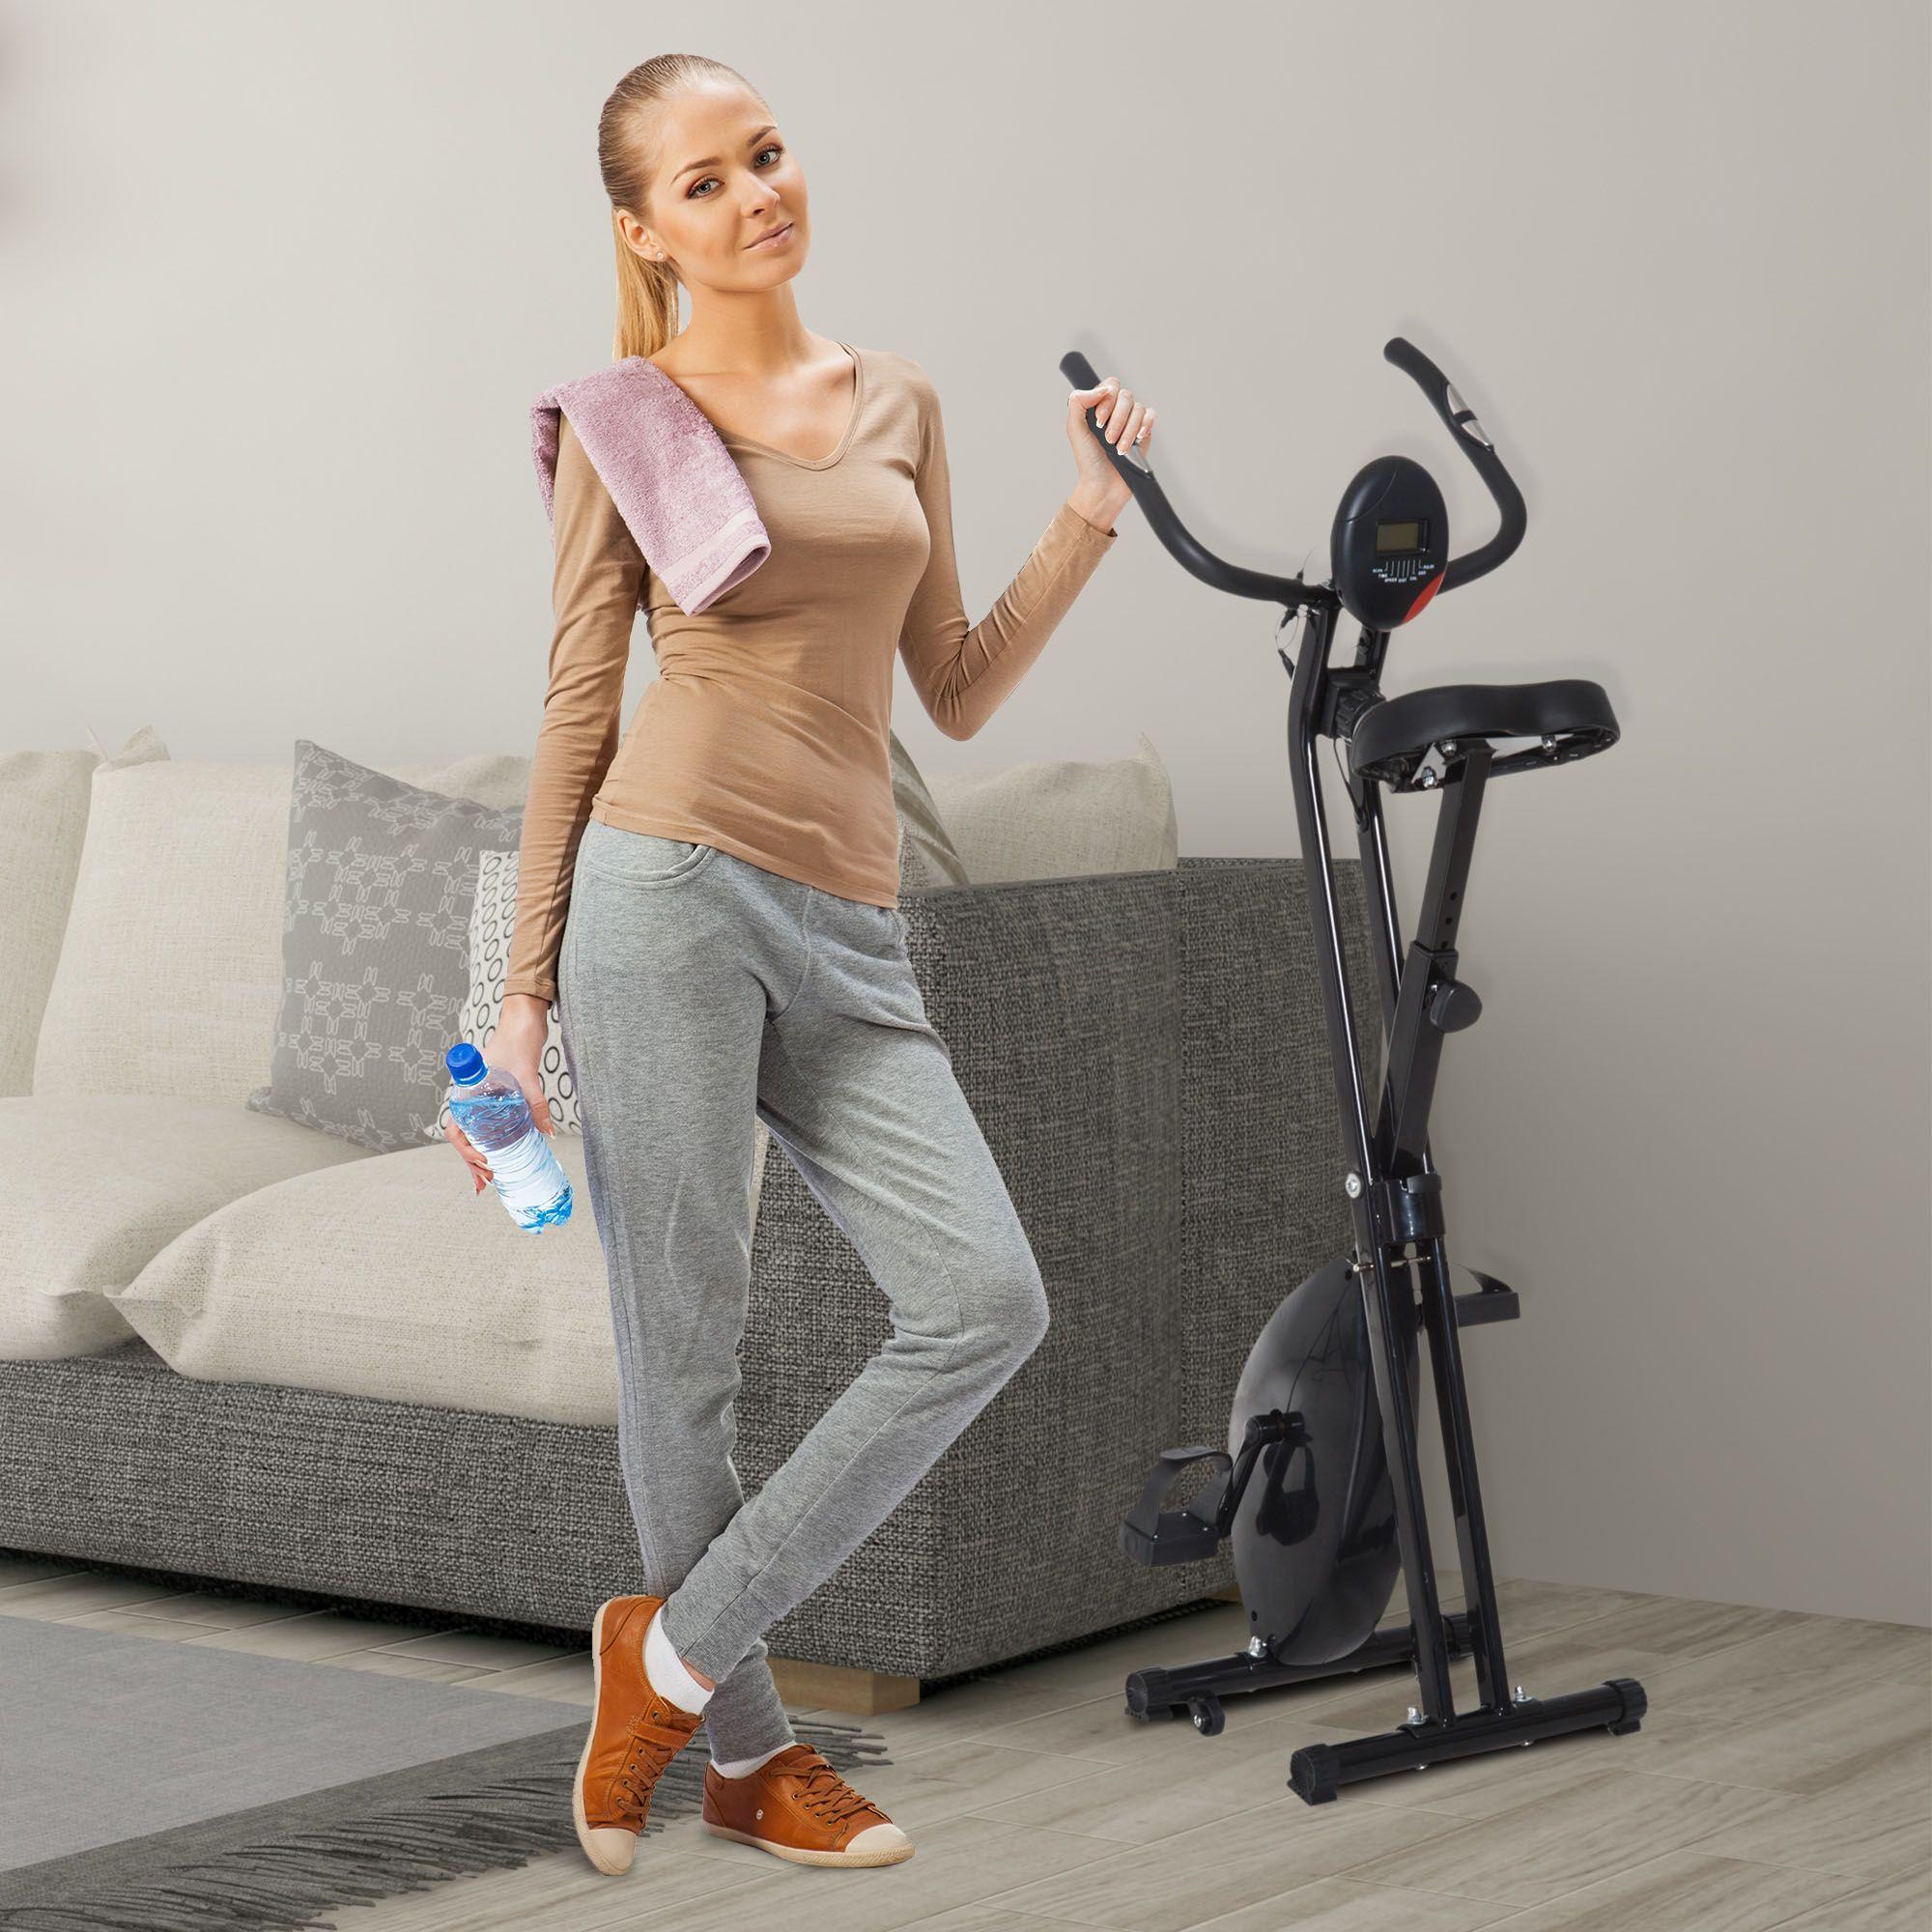 Jolitec® Bicicleta Estática Plegable Bicicleta Magnética Xbike